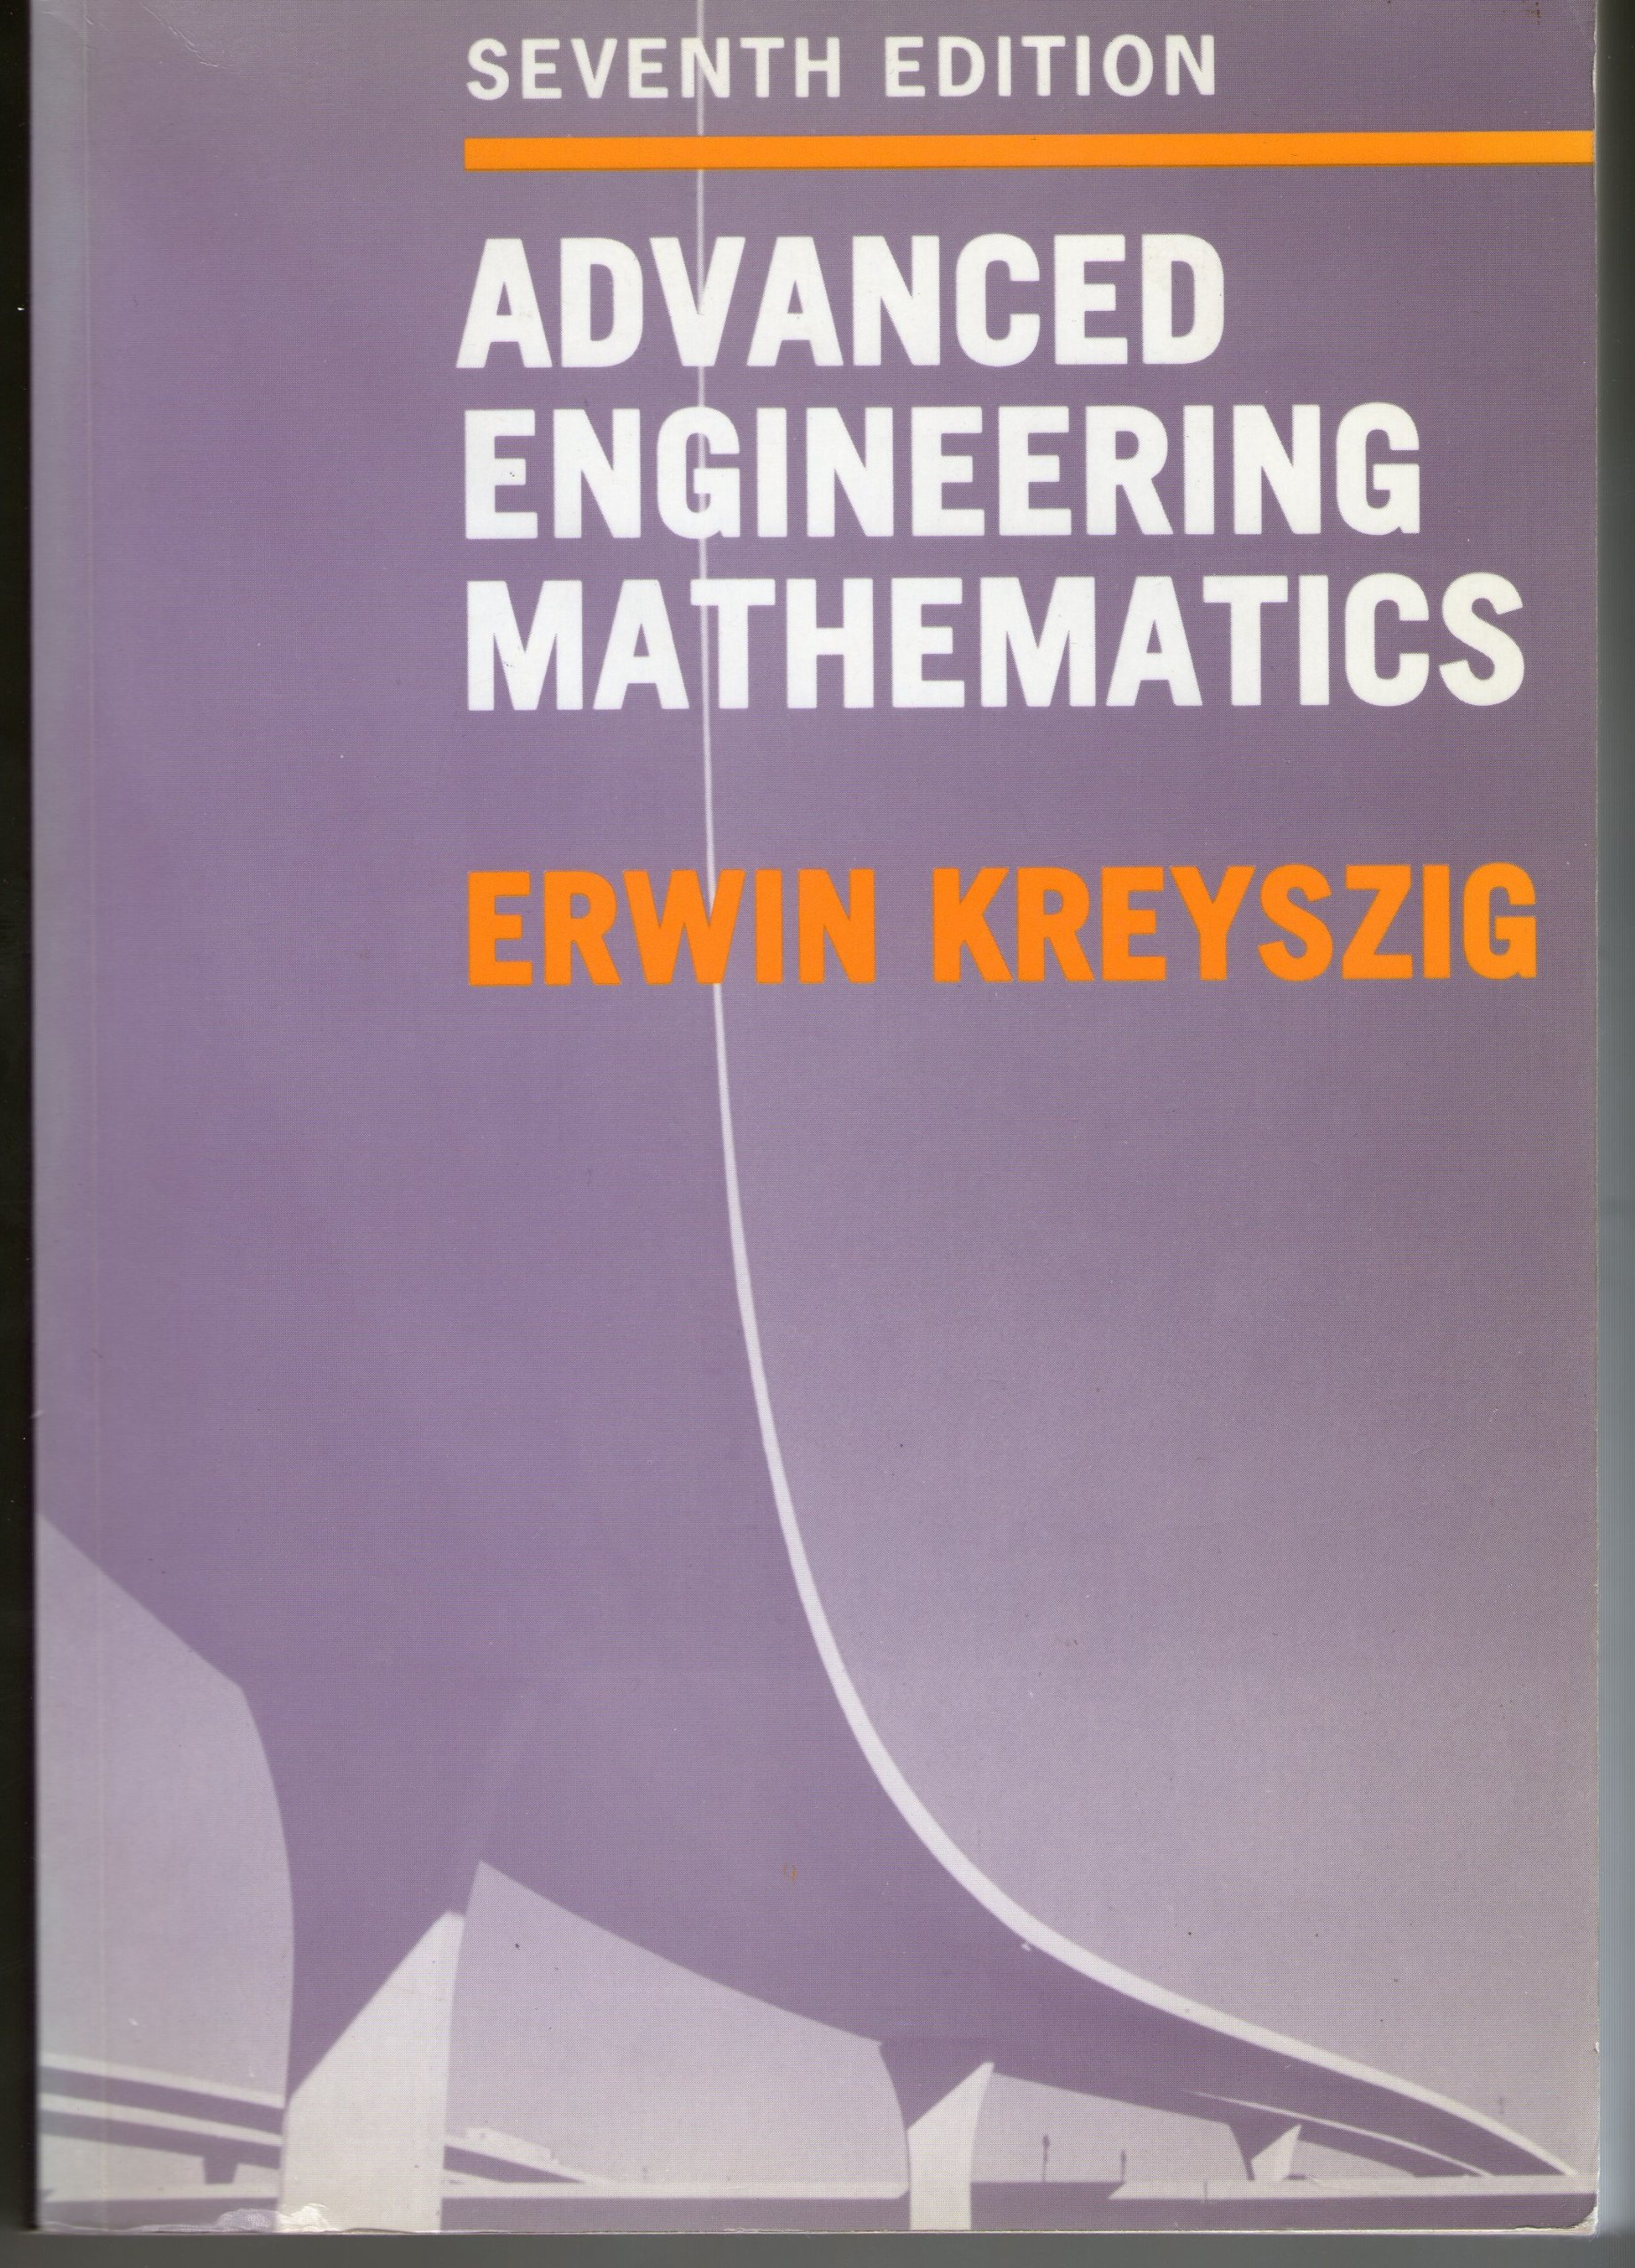 Advanced Engineering Mathematics: Erwin Kreyszig: 9780471599890:  Amazon.com: Books